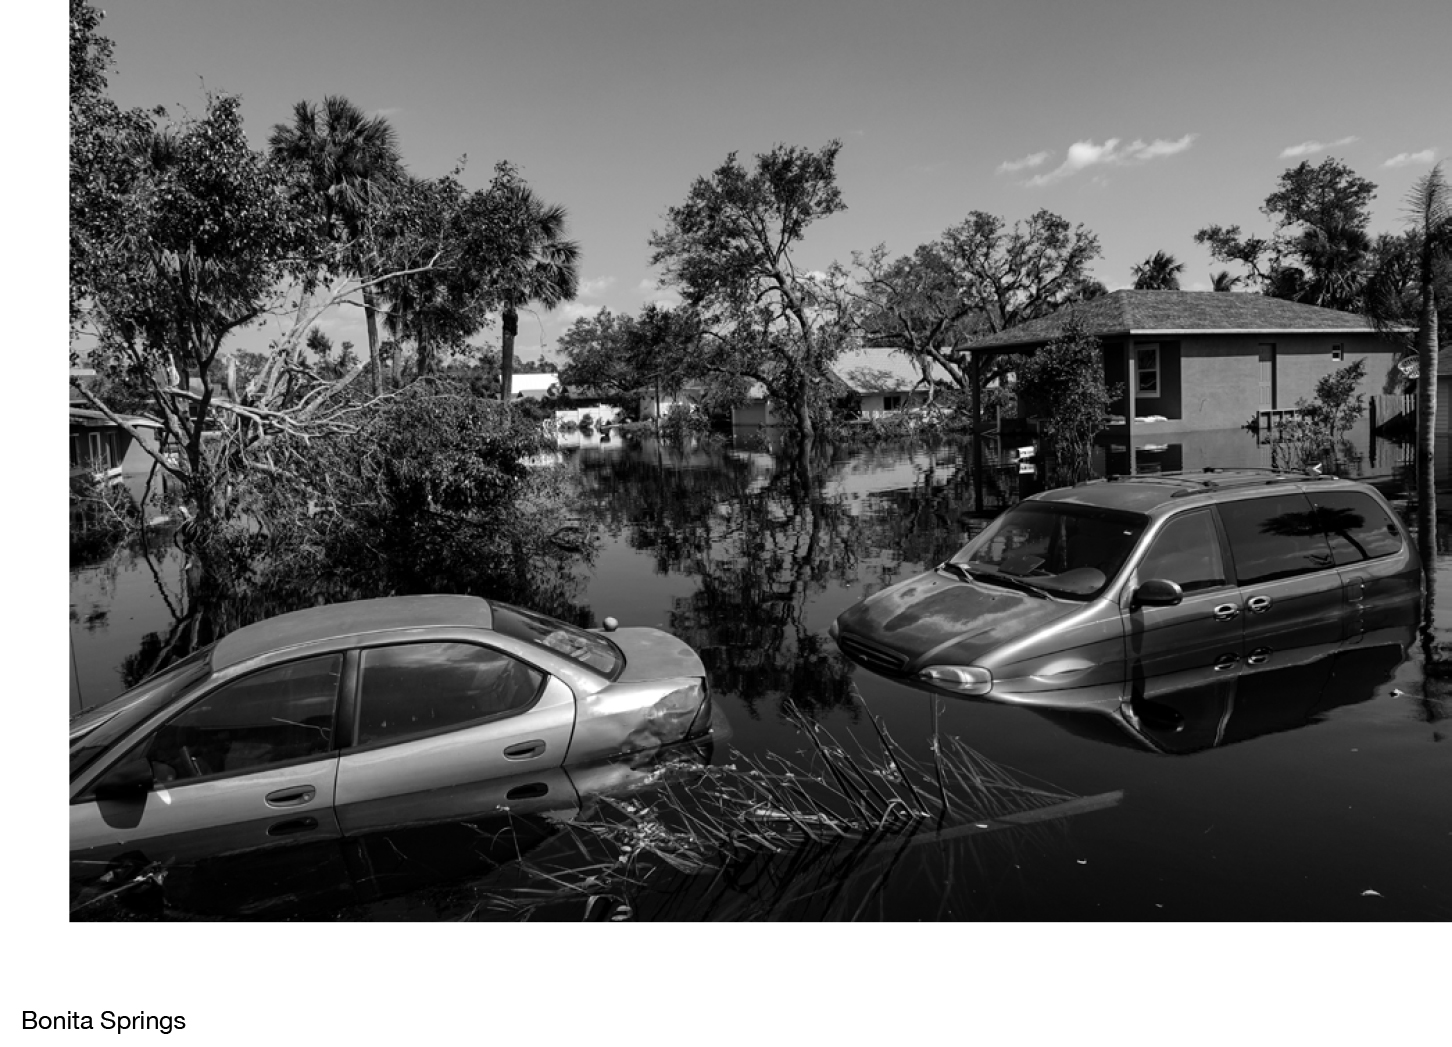 Robert LeBlanc Hurricane Irma %22Welcome To Paradise%22-9.jpg